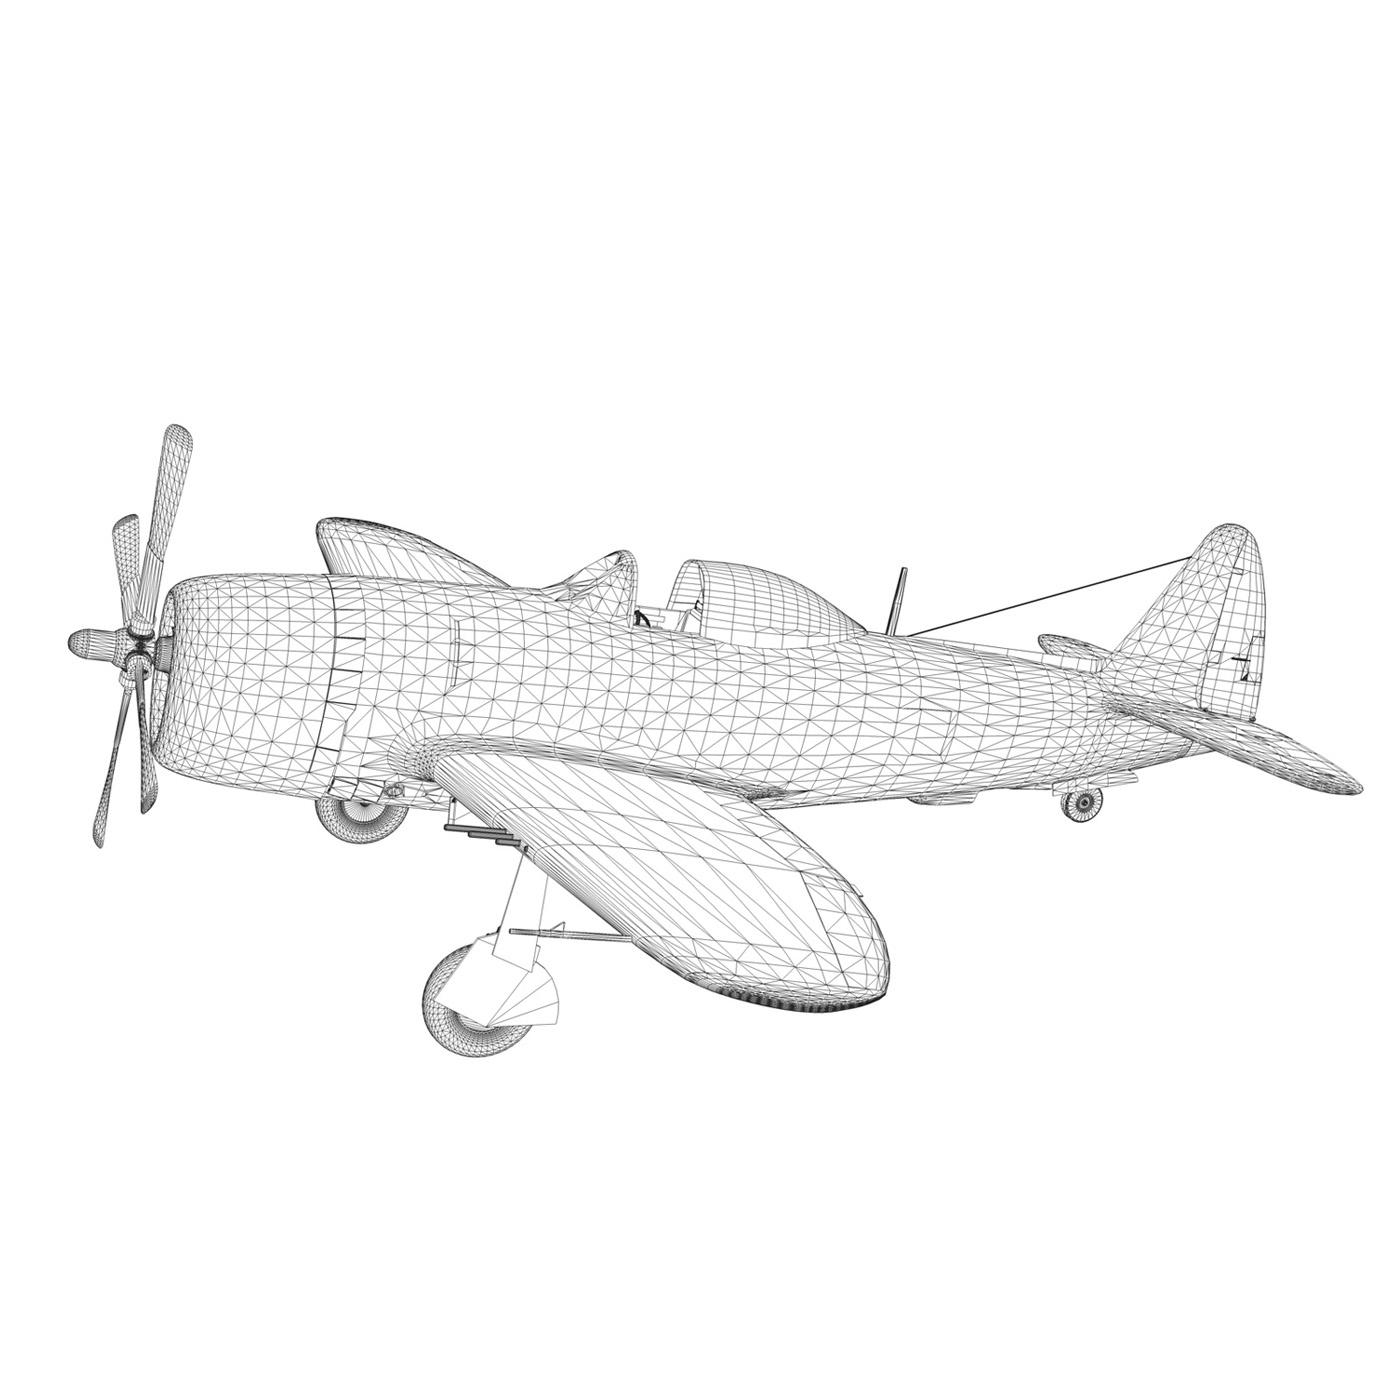 republic p-47m thunderbolt – pengie v 3d model 3ds c4d fbx lwo lw lws obj 279733